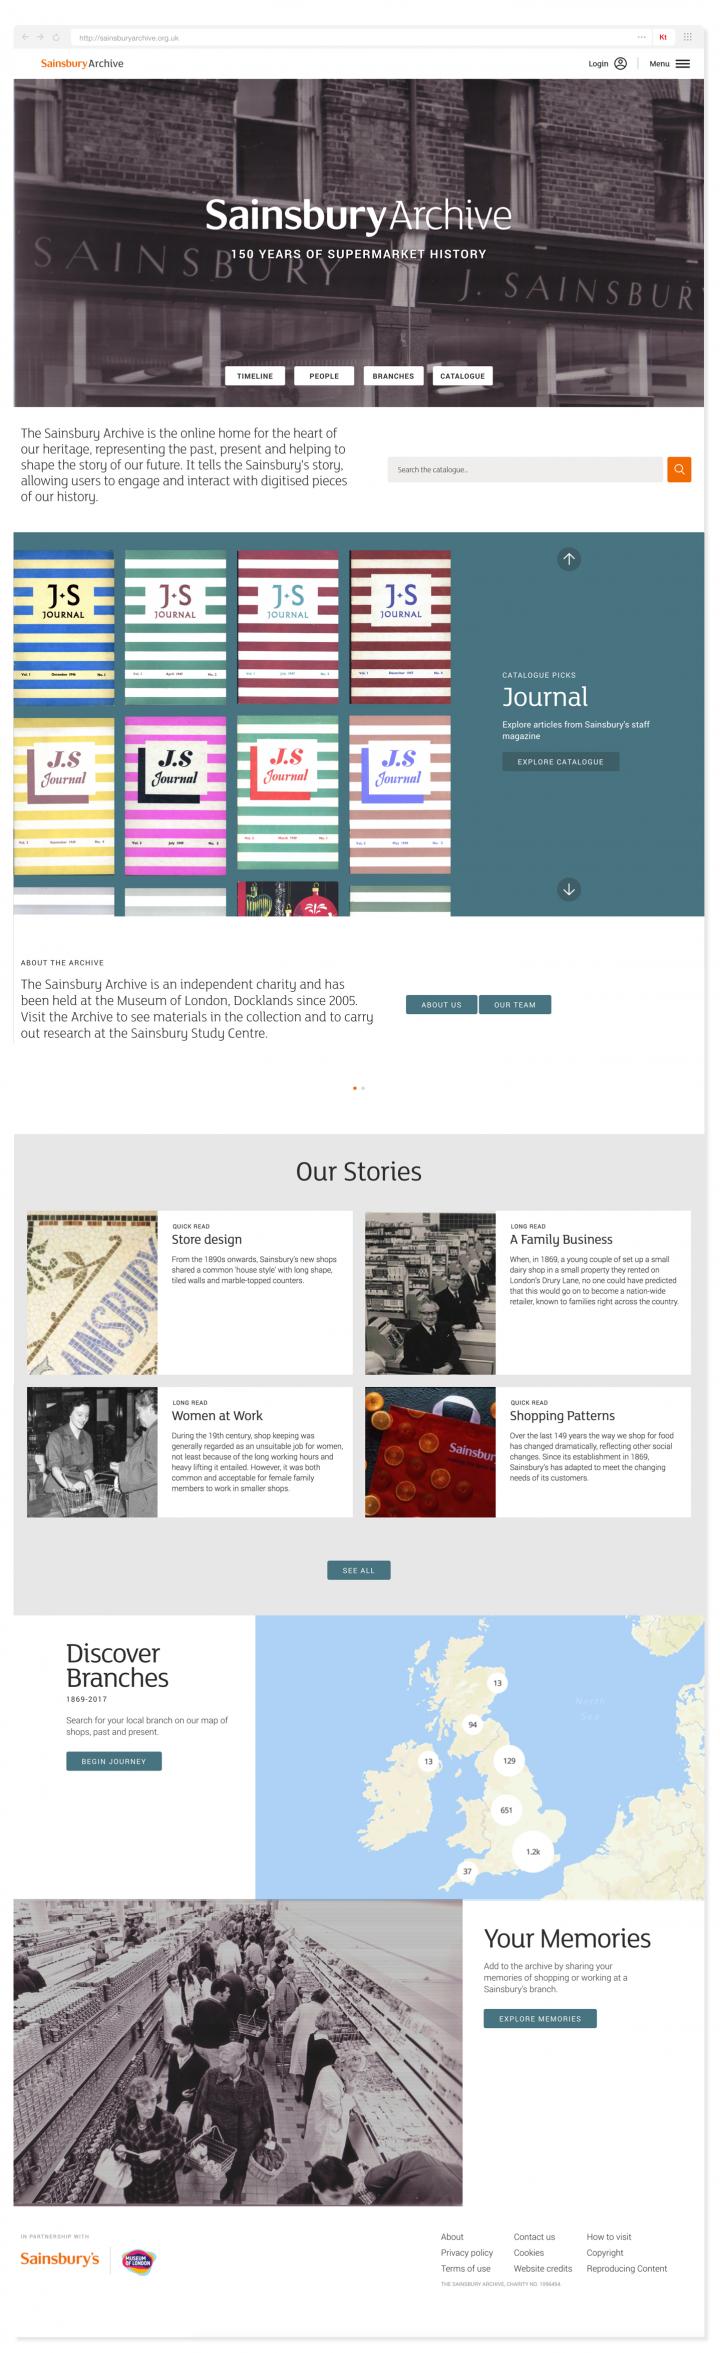 Sainsbury Archive homepage in full